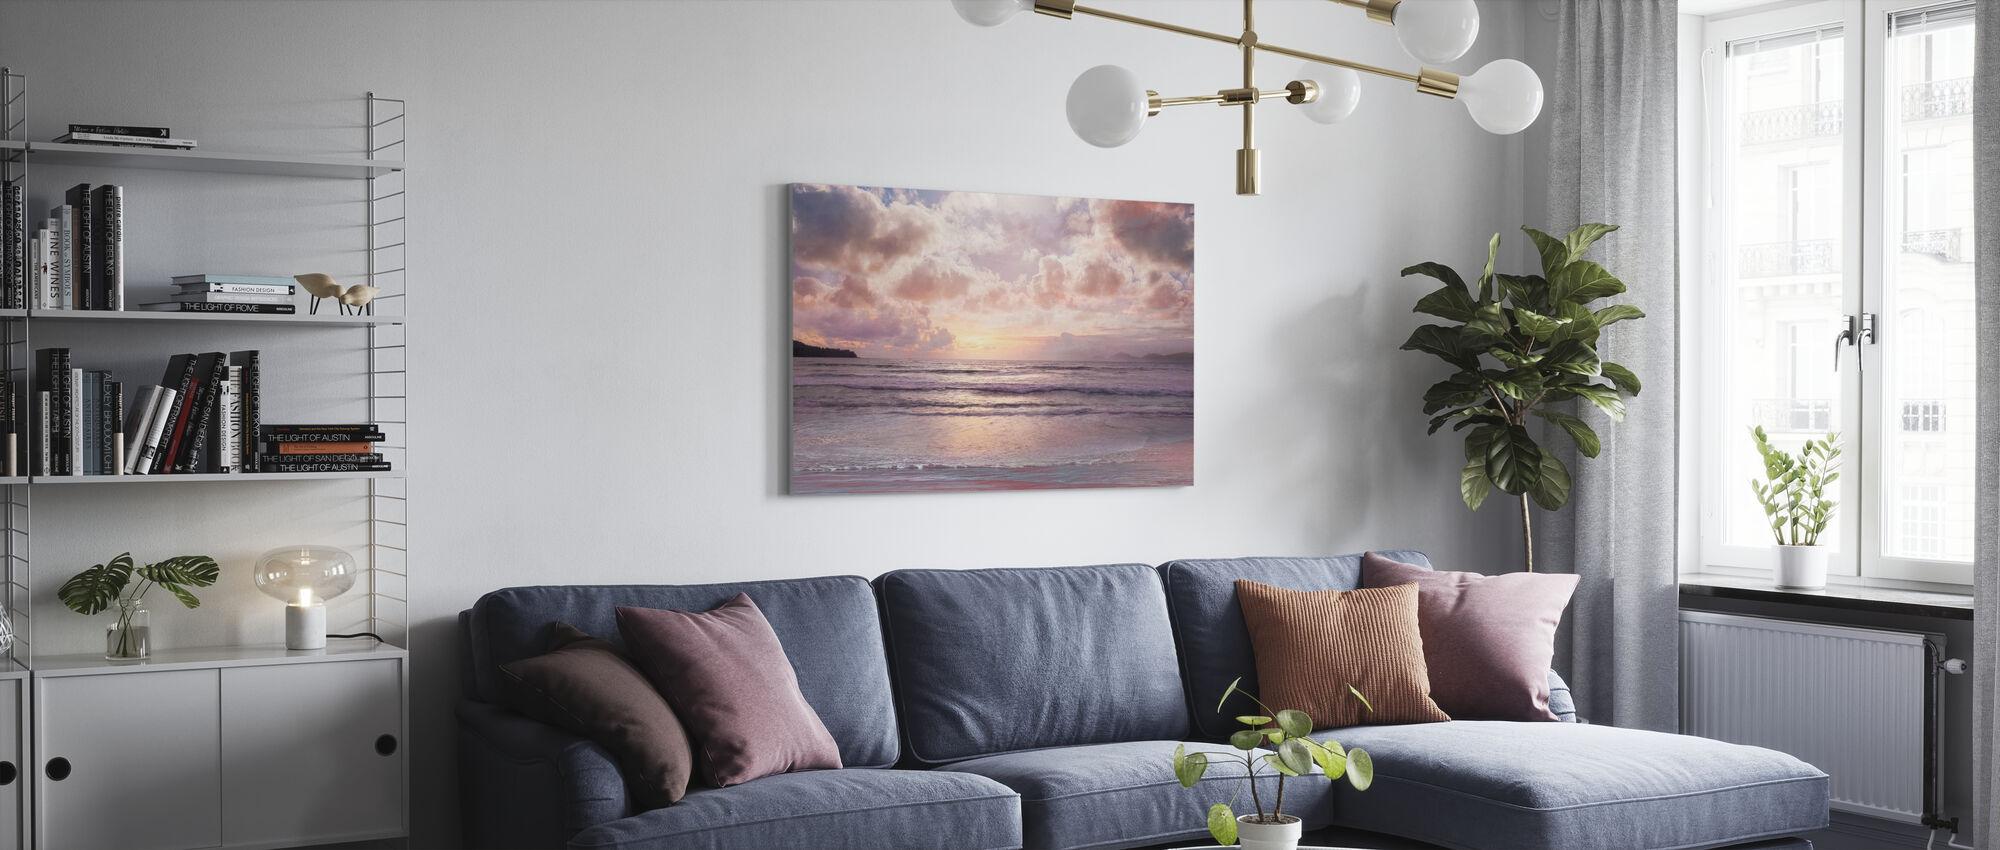 Rosa Horisont - Canvastavla - Vardagsrum